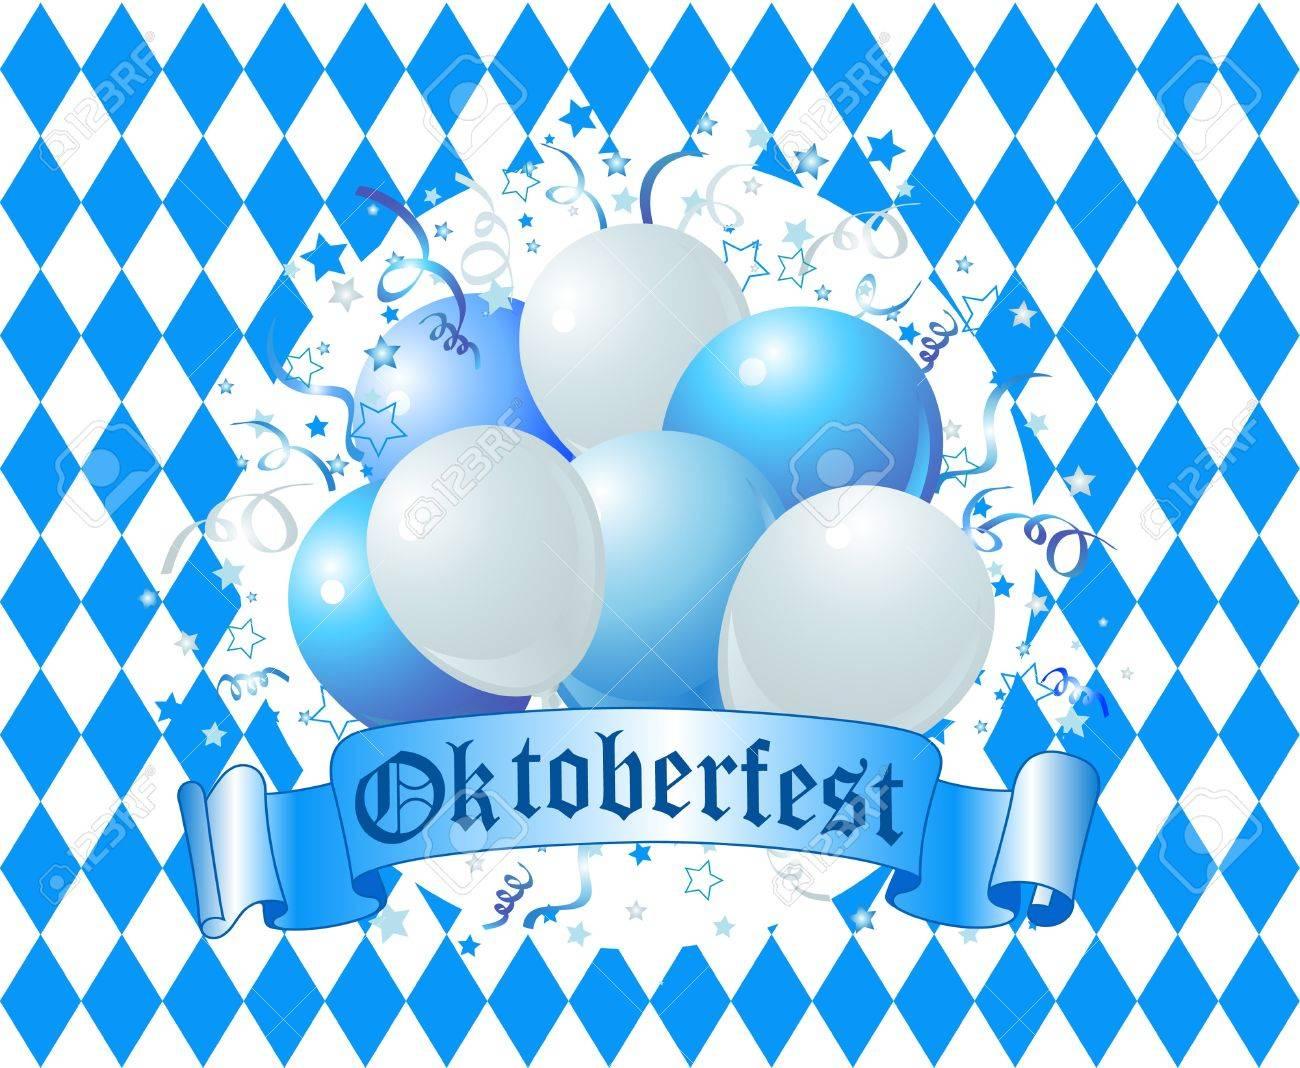 Oktoberfest Balloons Celebration Background Stock Vector - 10418258